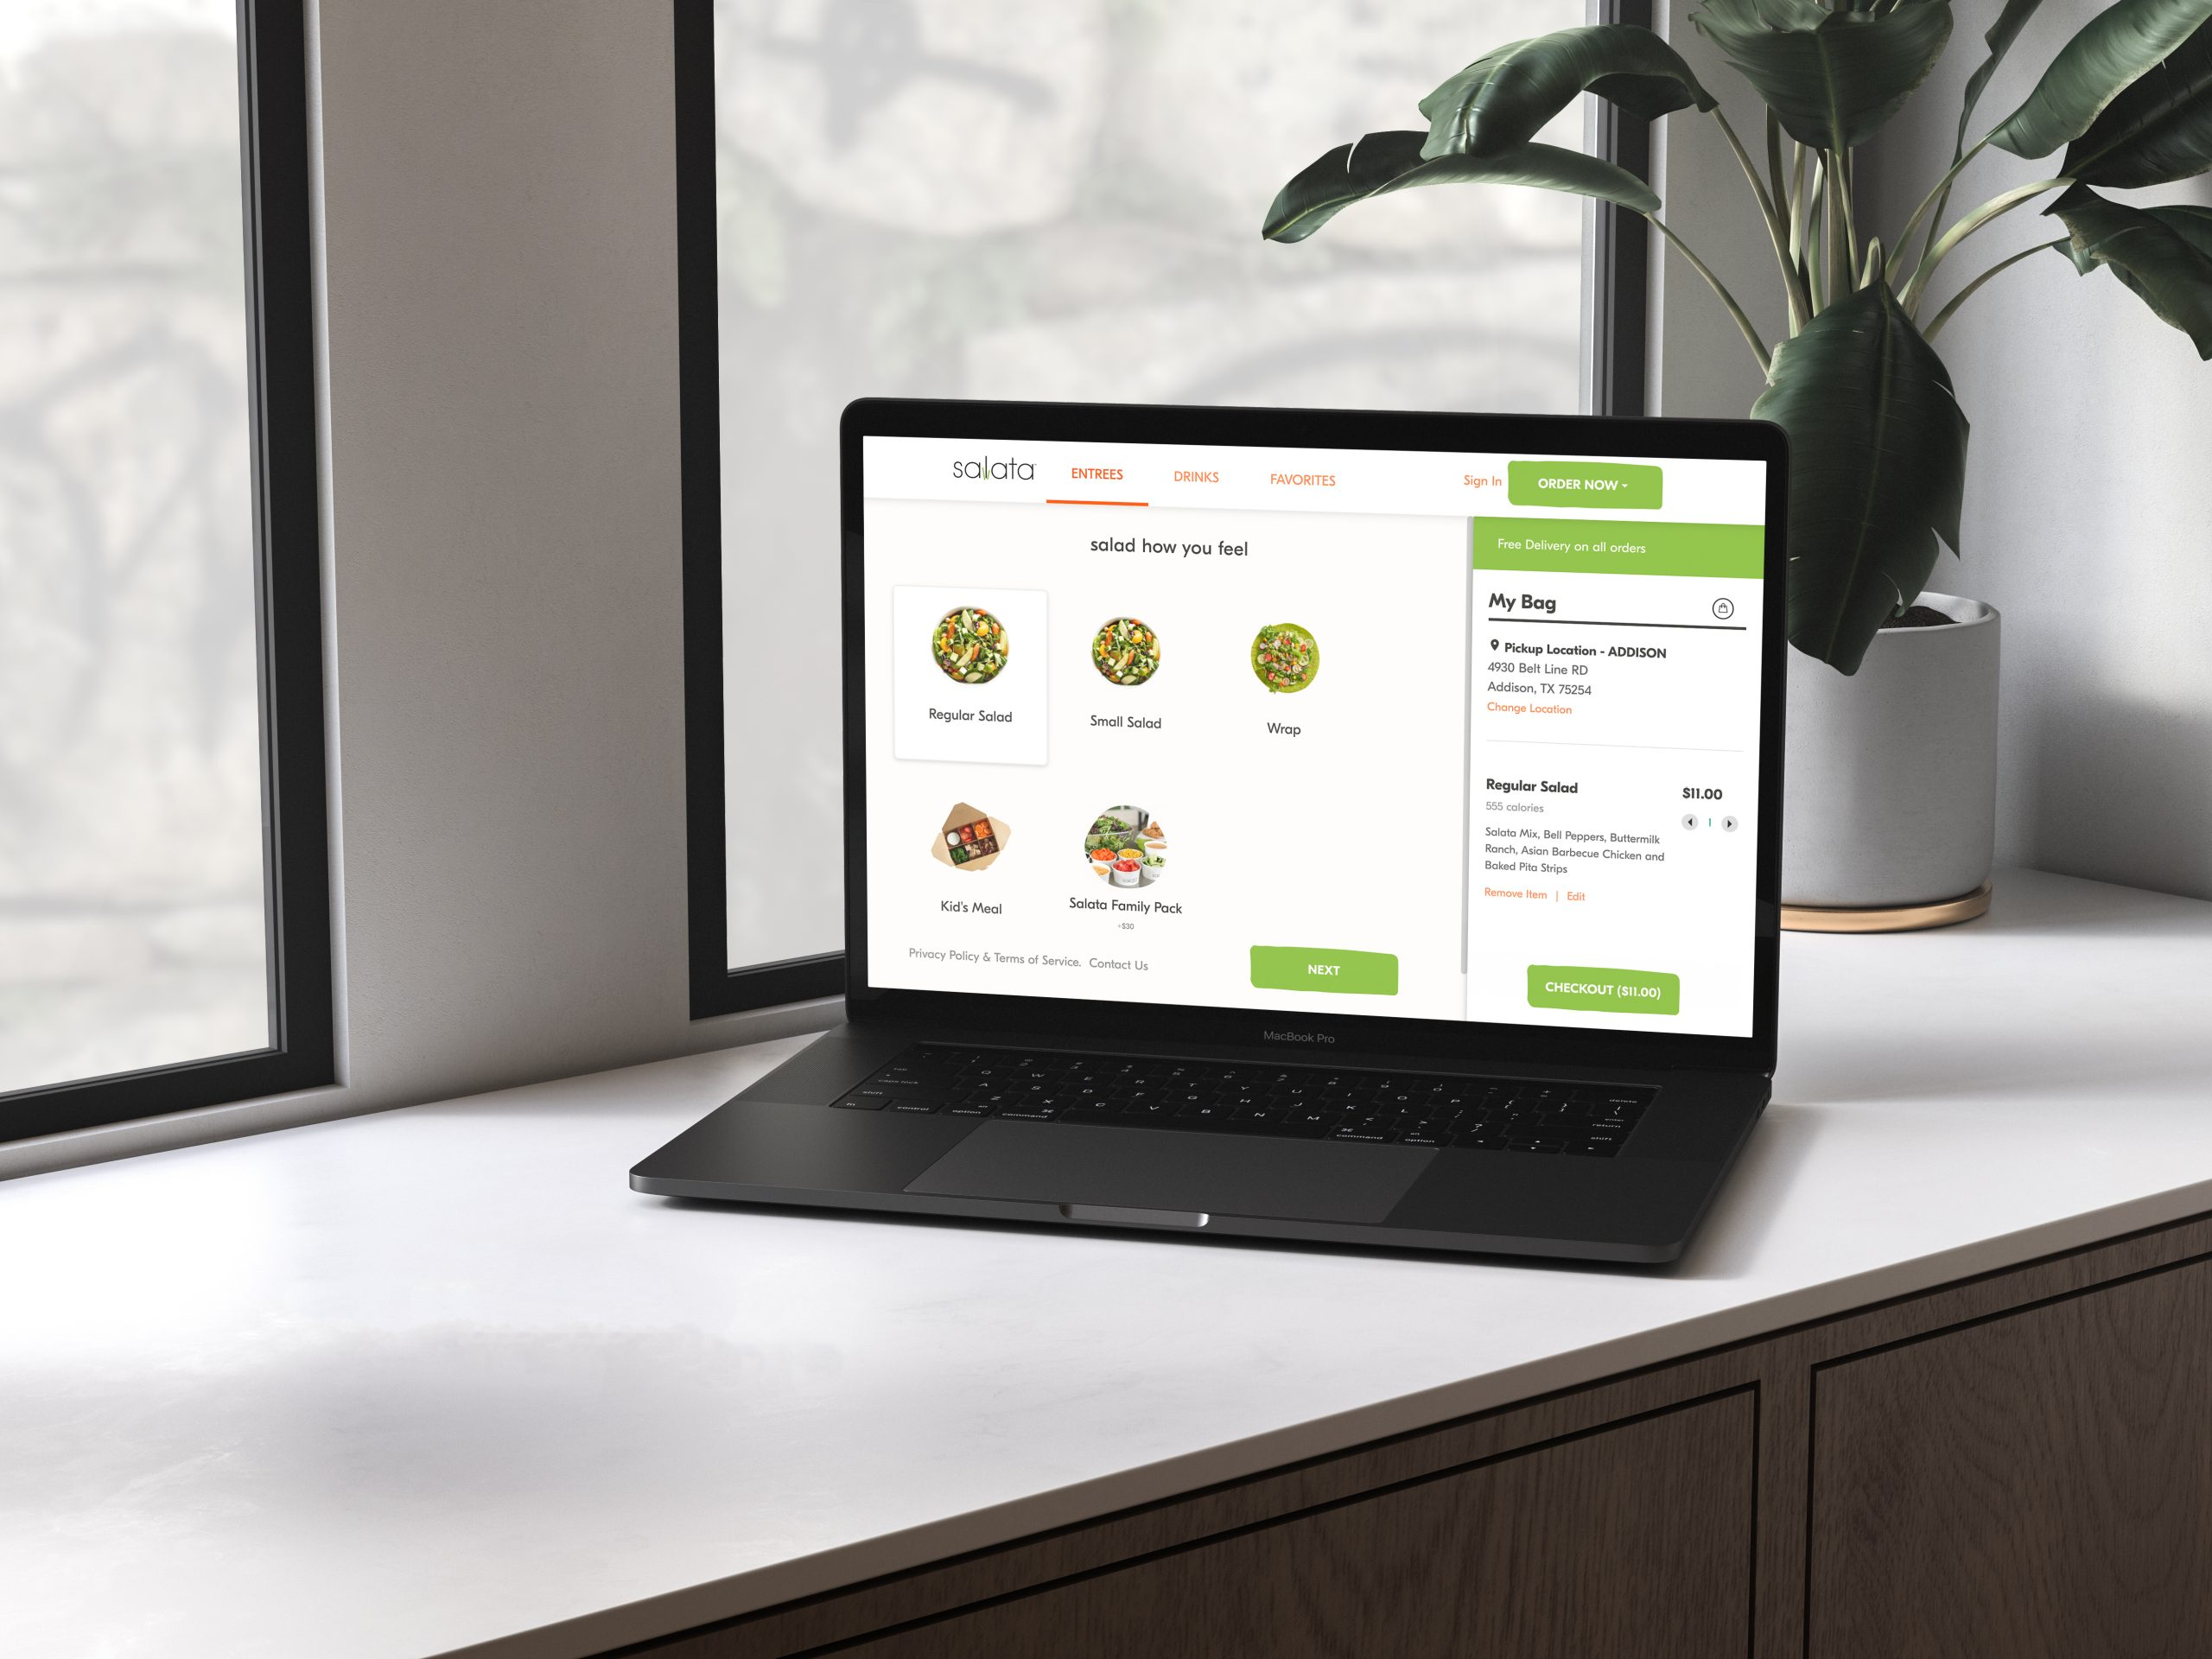 salata online ordering on laptop